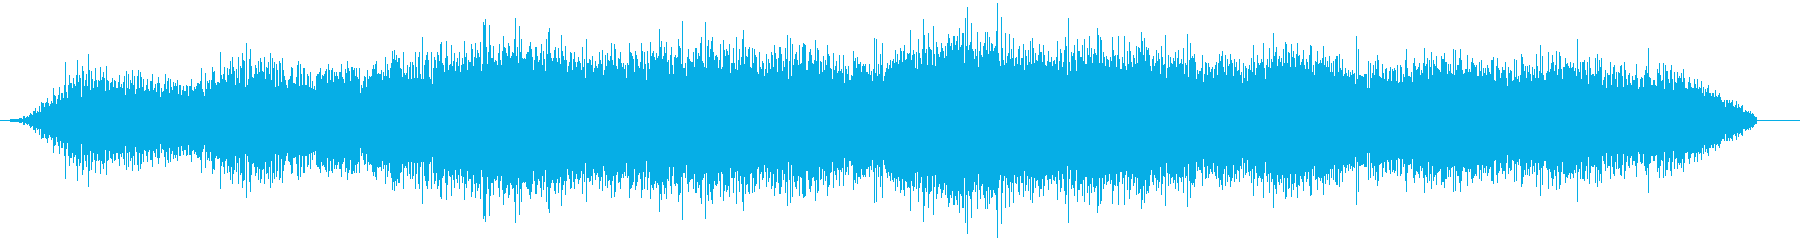 Huge Sub Space Ex...の再生済みの波形